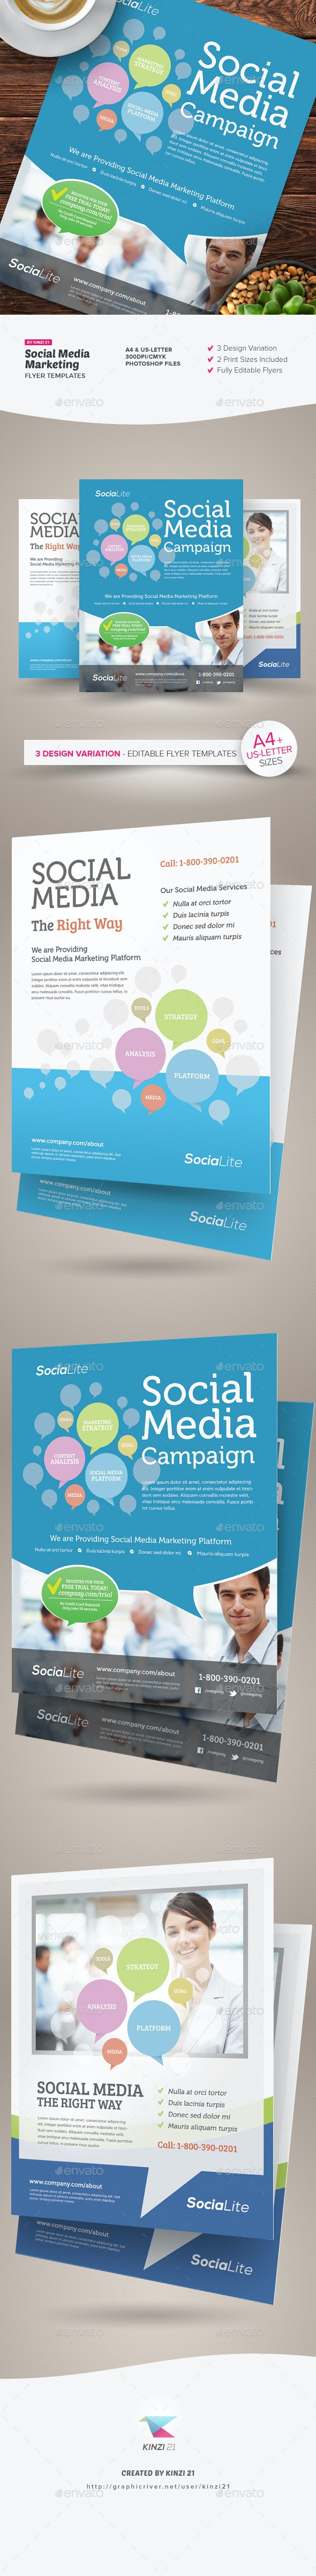 Social Media Marketing Flyer - Corporate Flyers